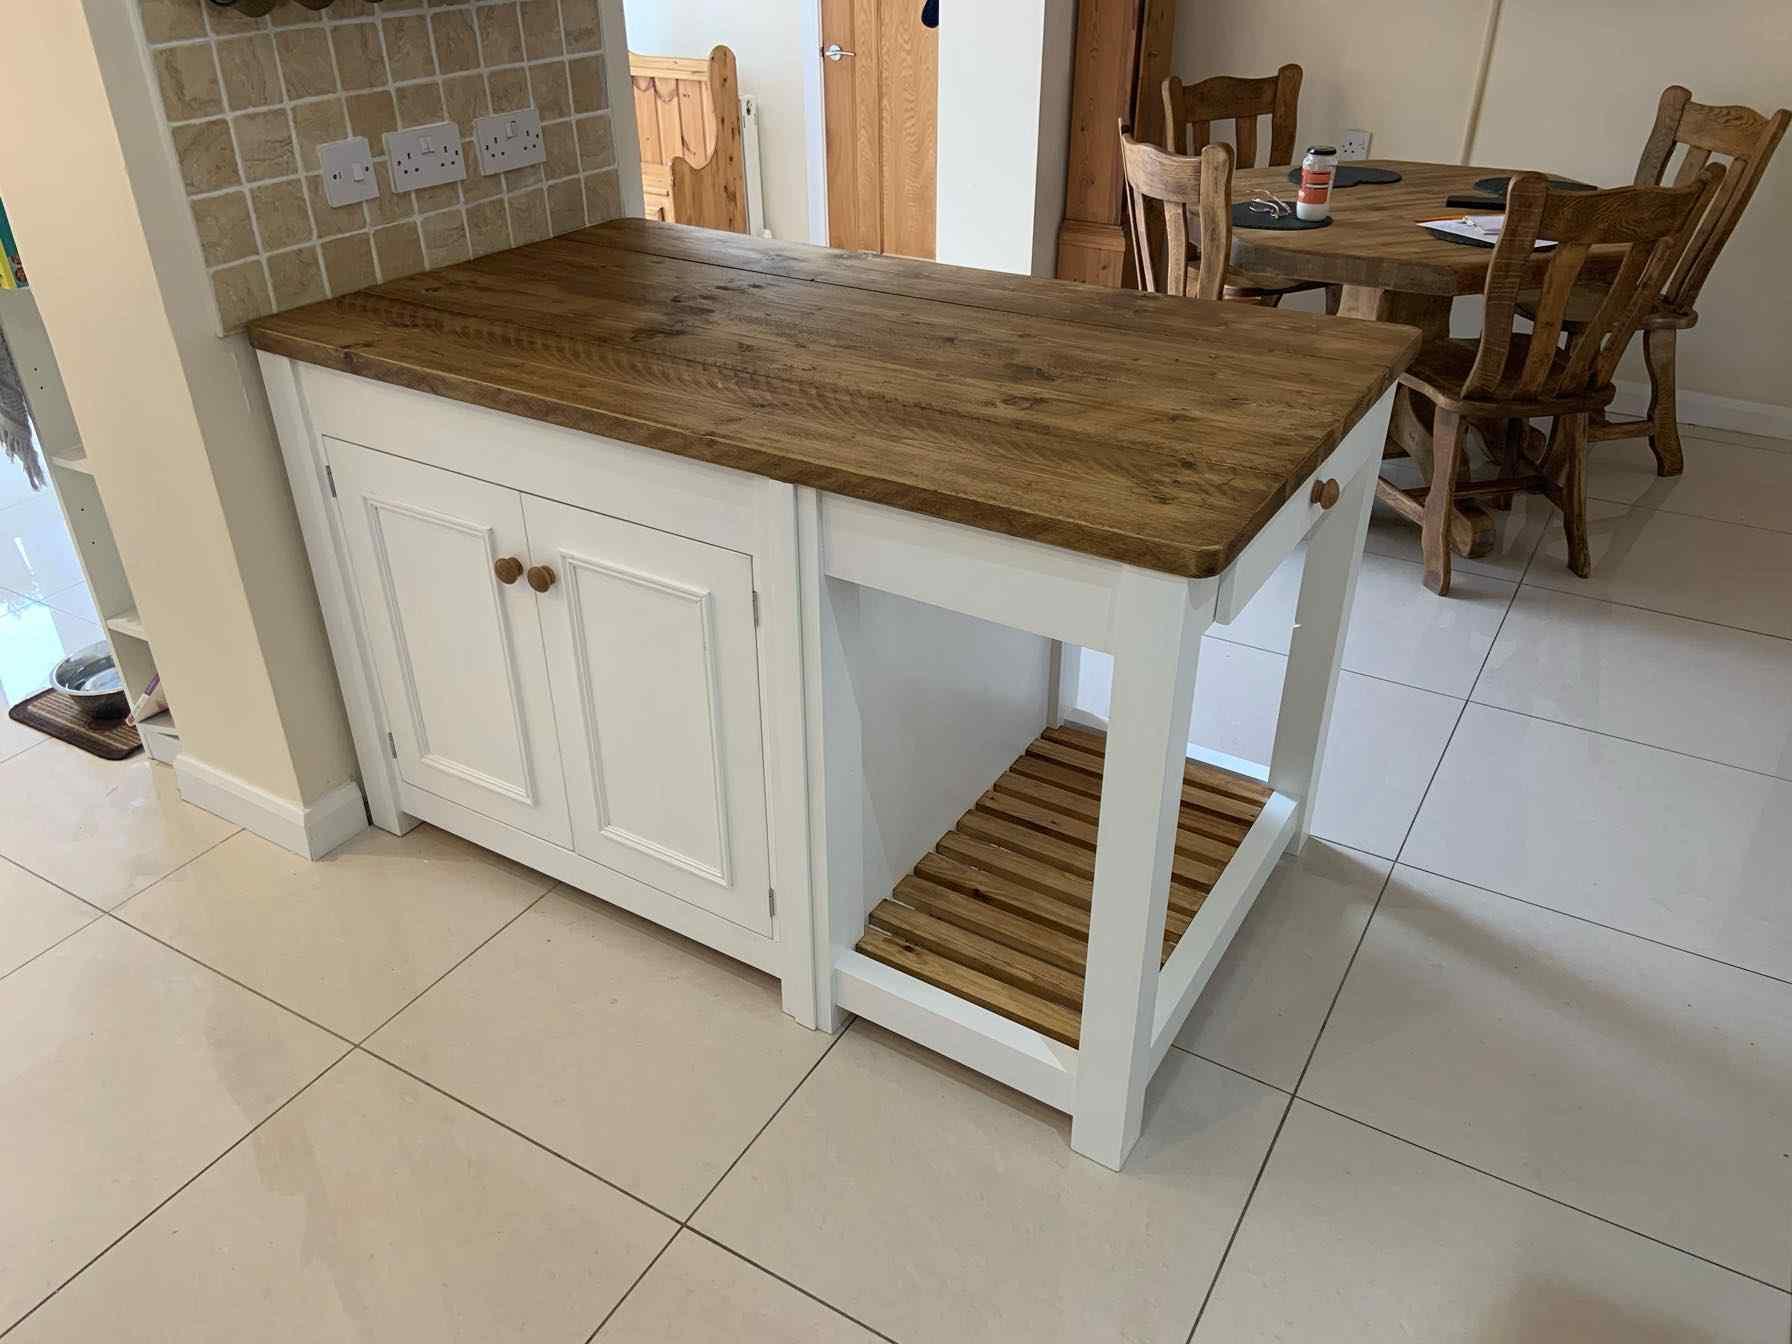 bespoke reclaimed wood kitchen island